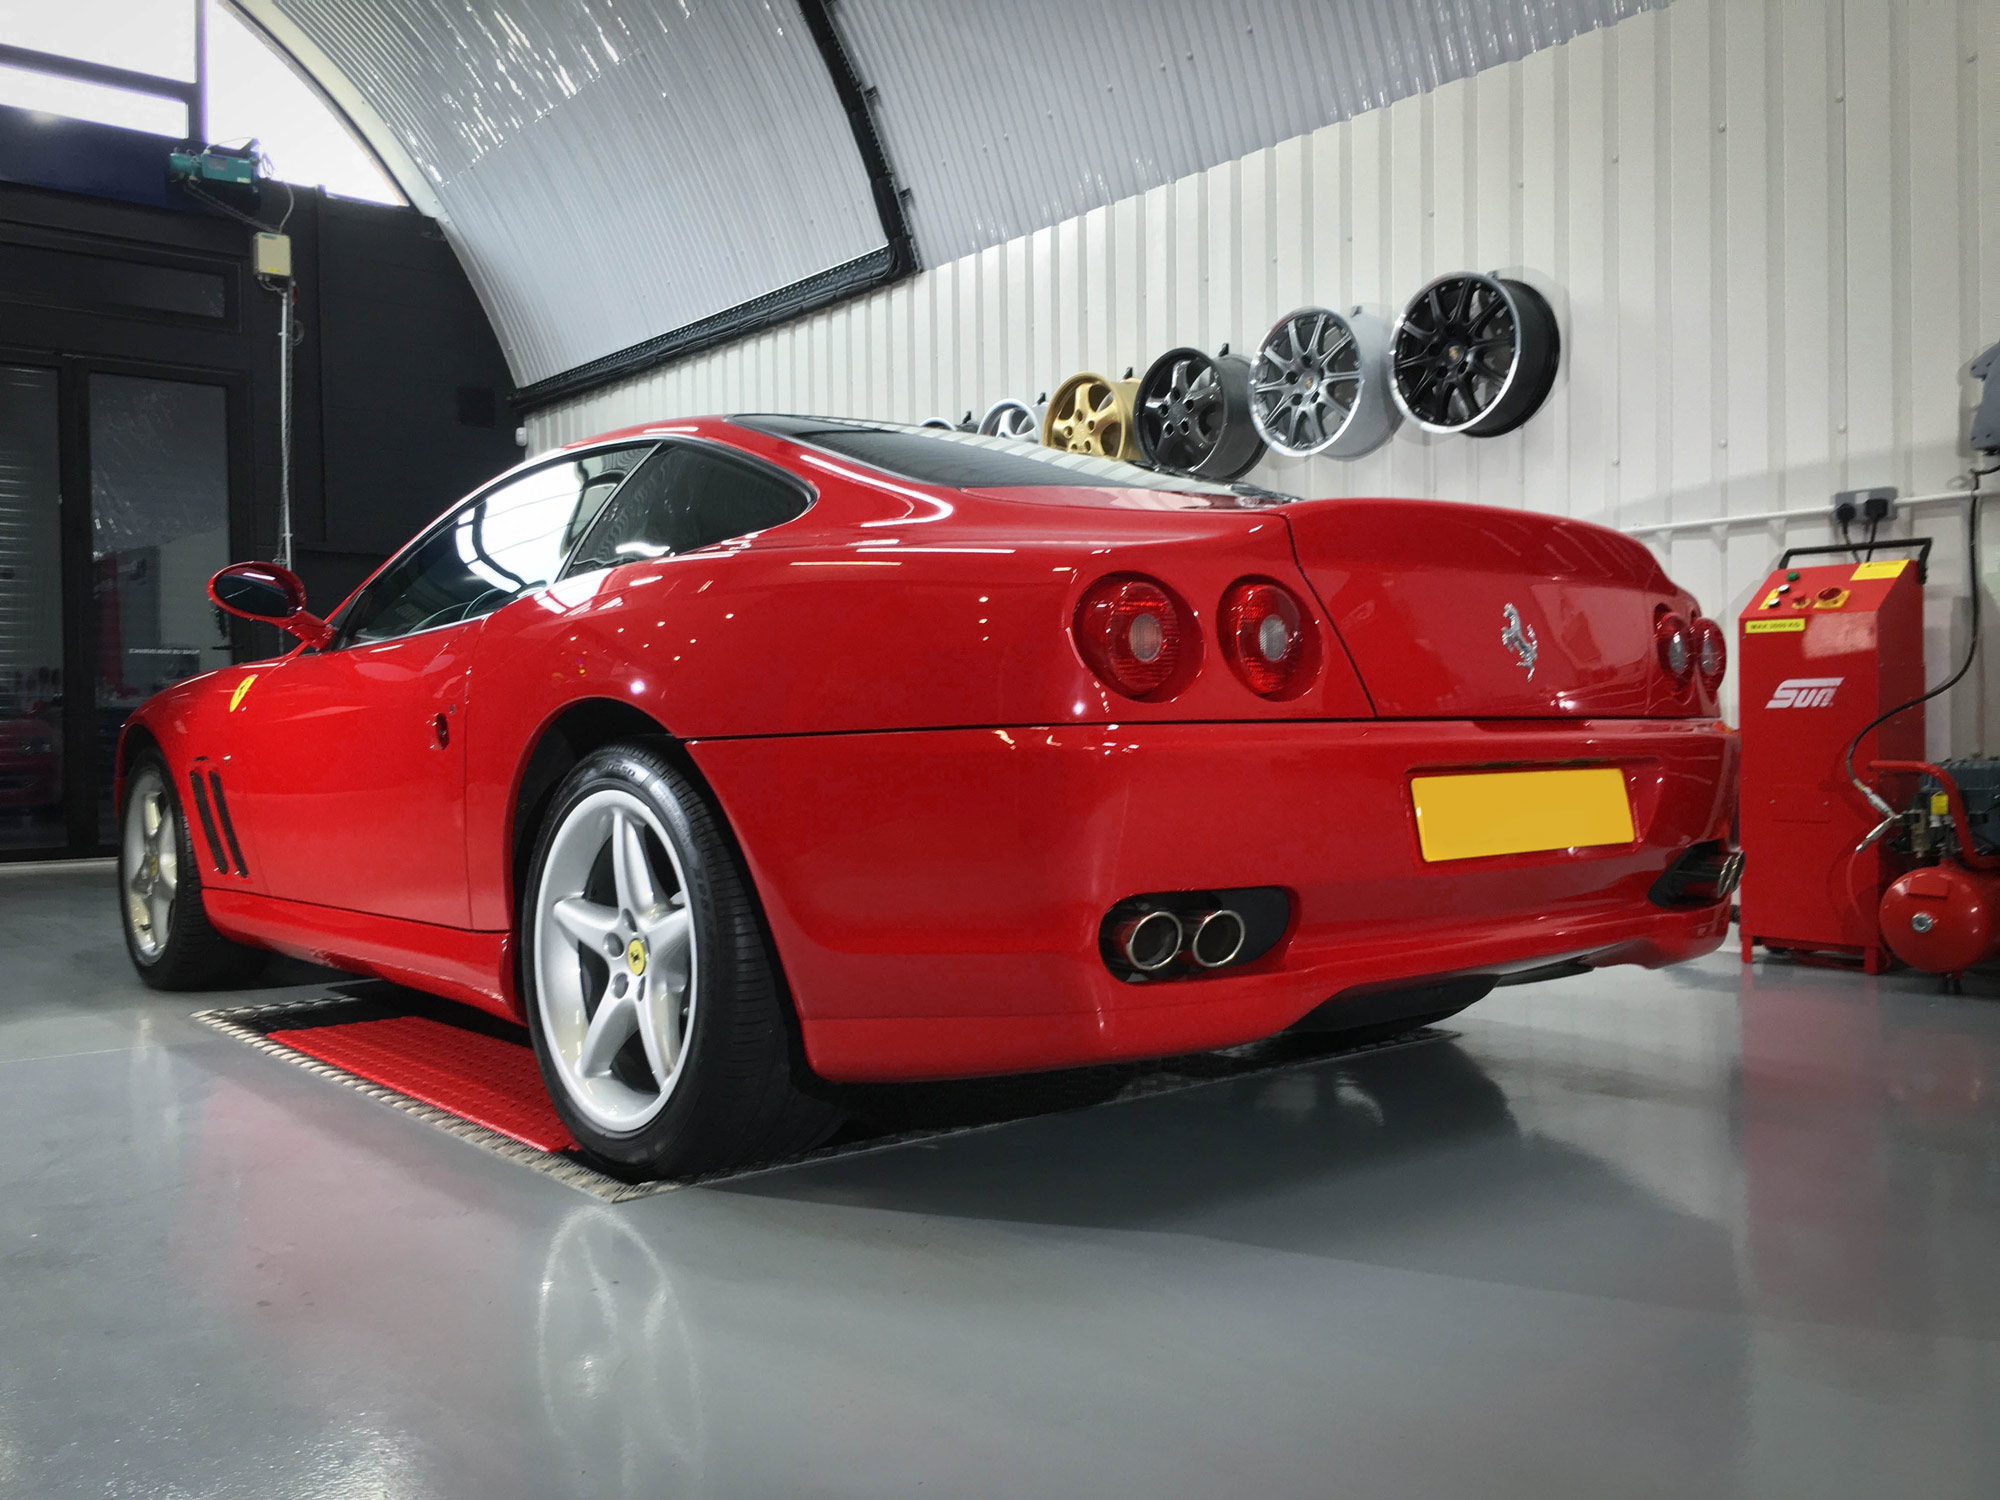 Ferrari_550_Maranello-rear-passengers